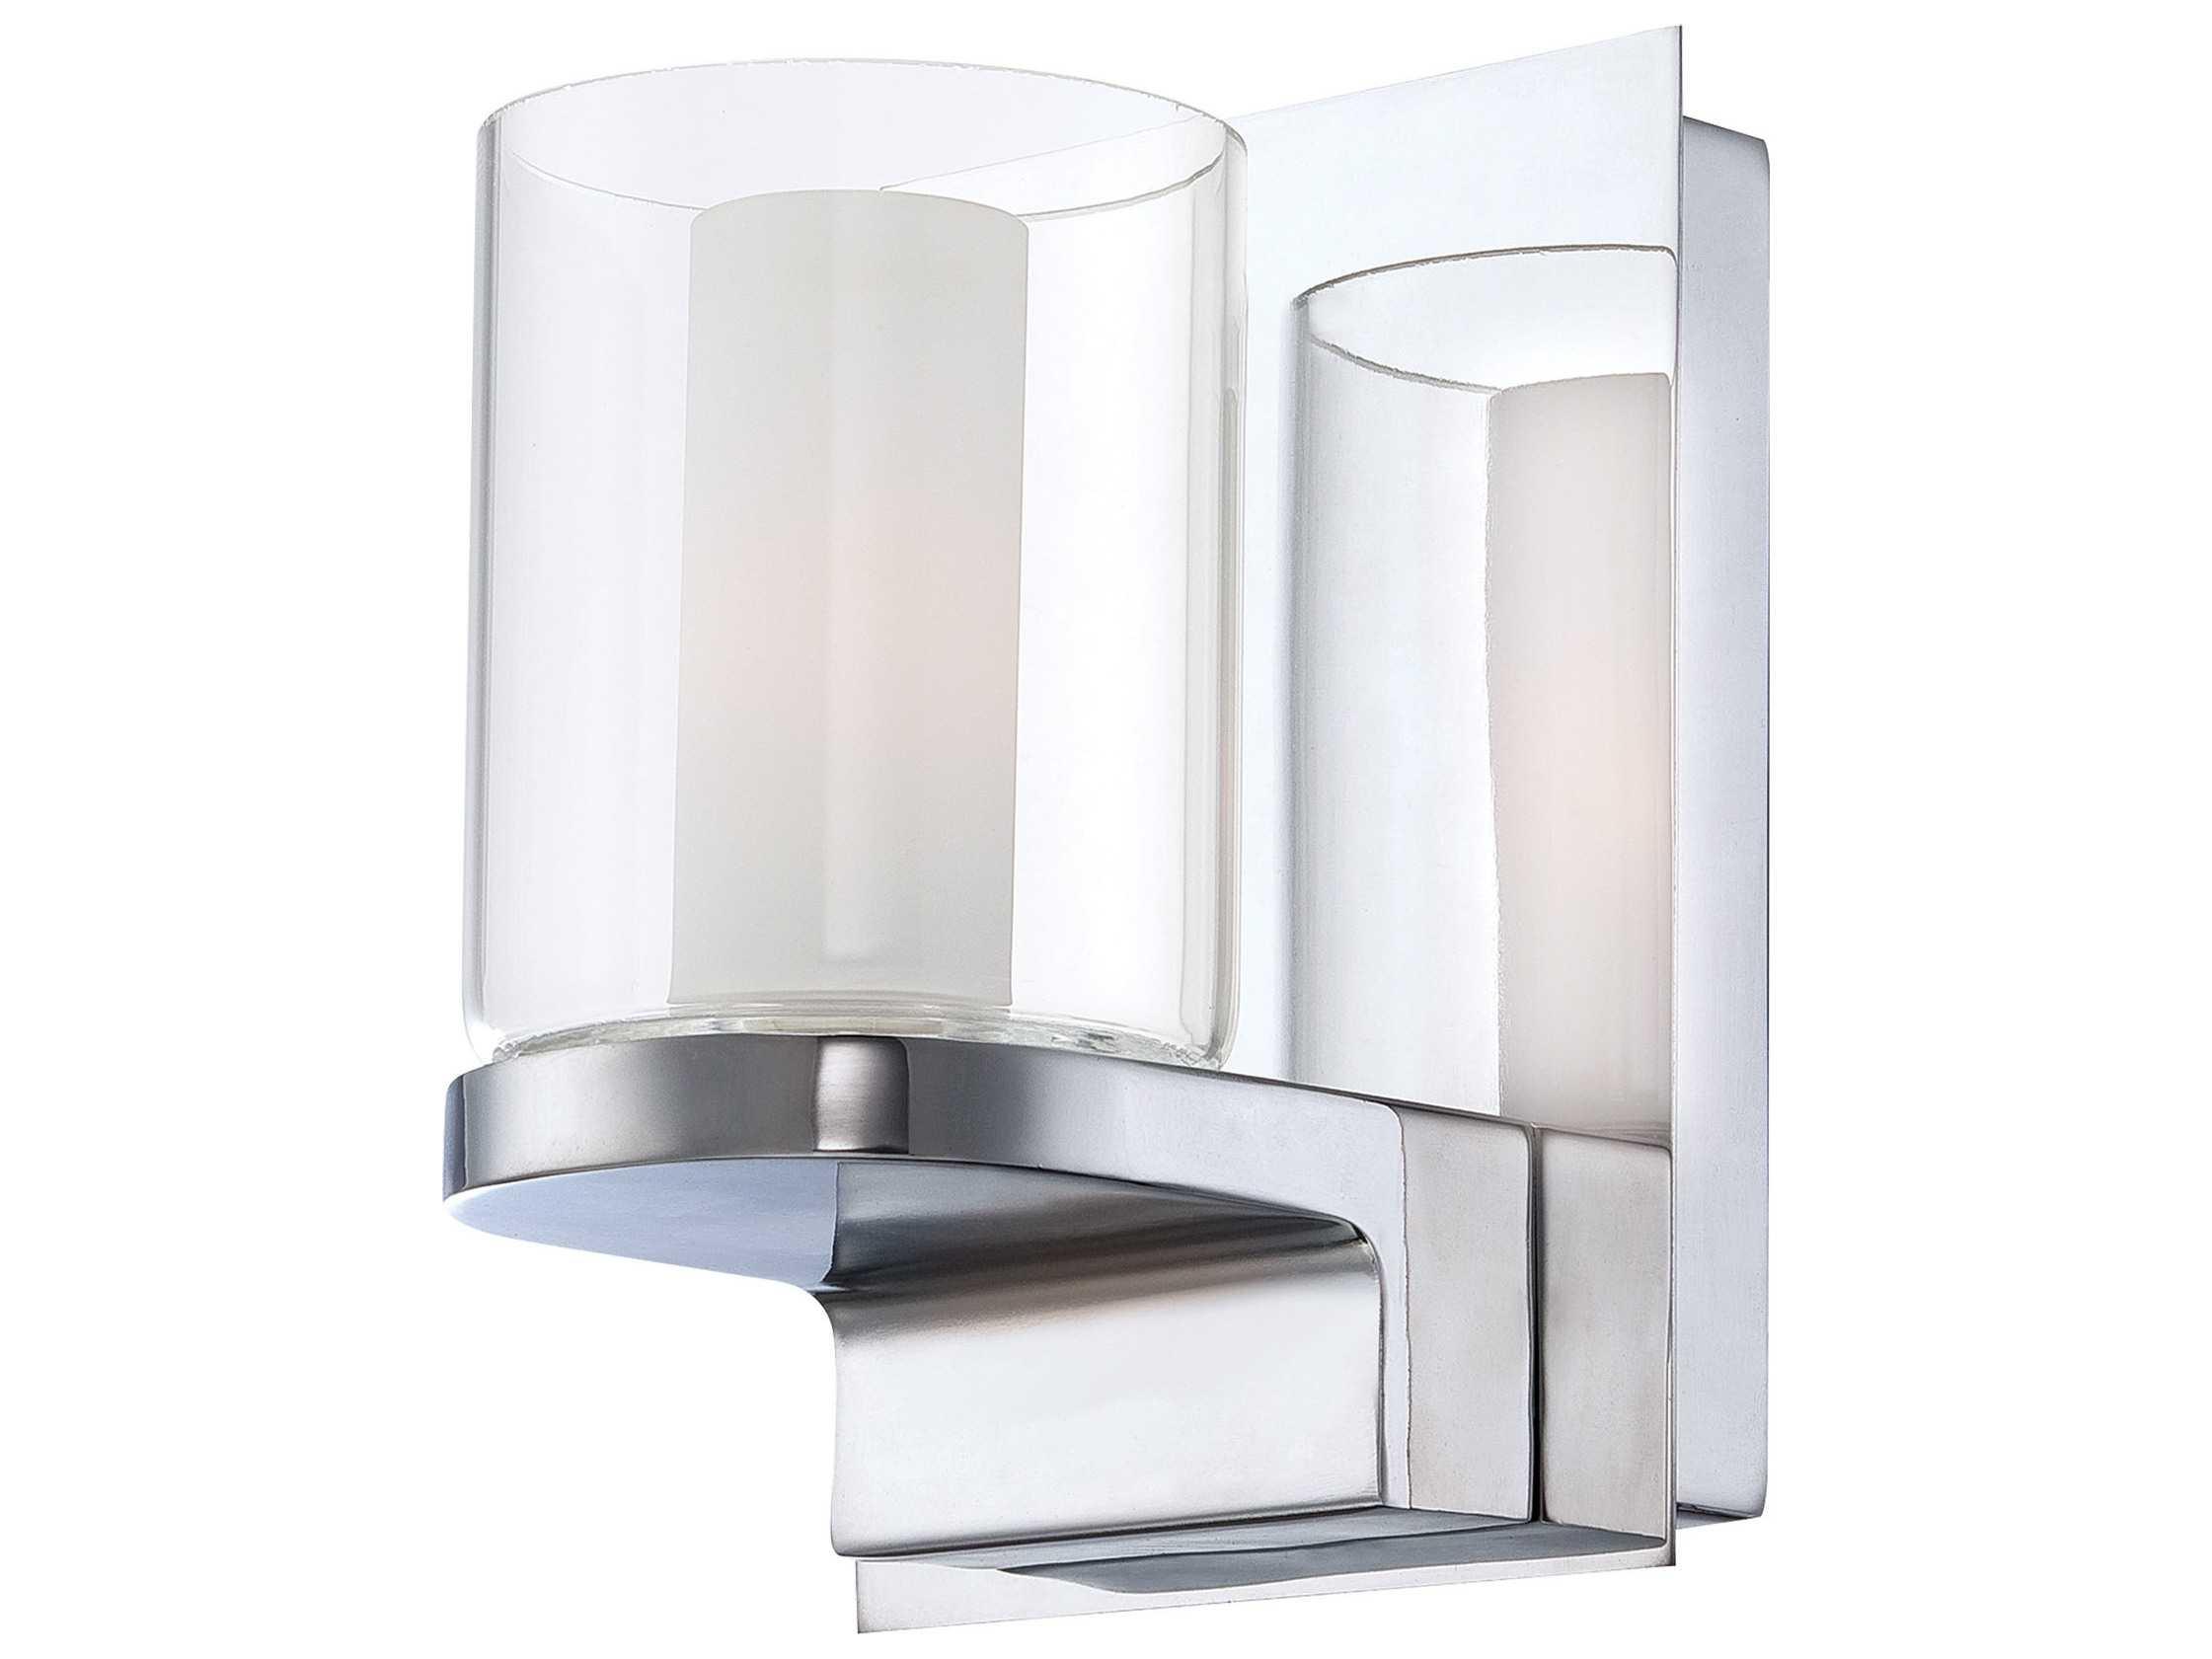 Vanity Light Glass : Alico Anchor Chrome & White Opal Glass Vanity Light ALCBV22119015